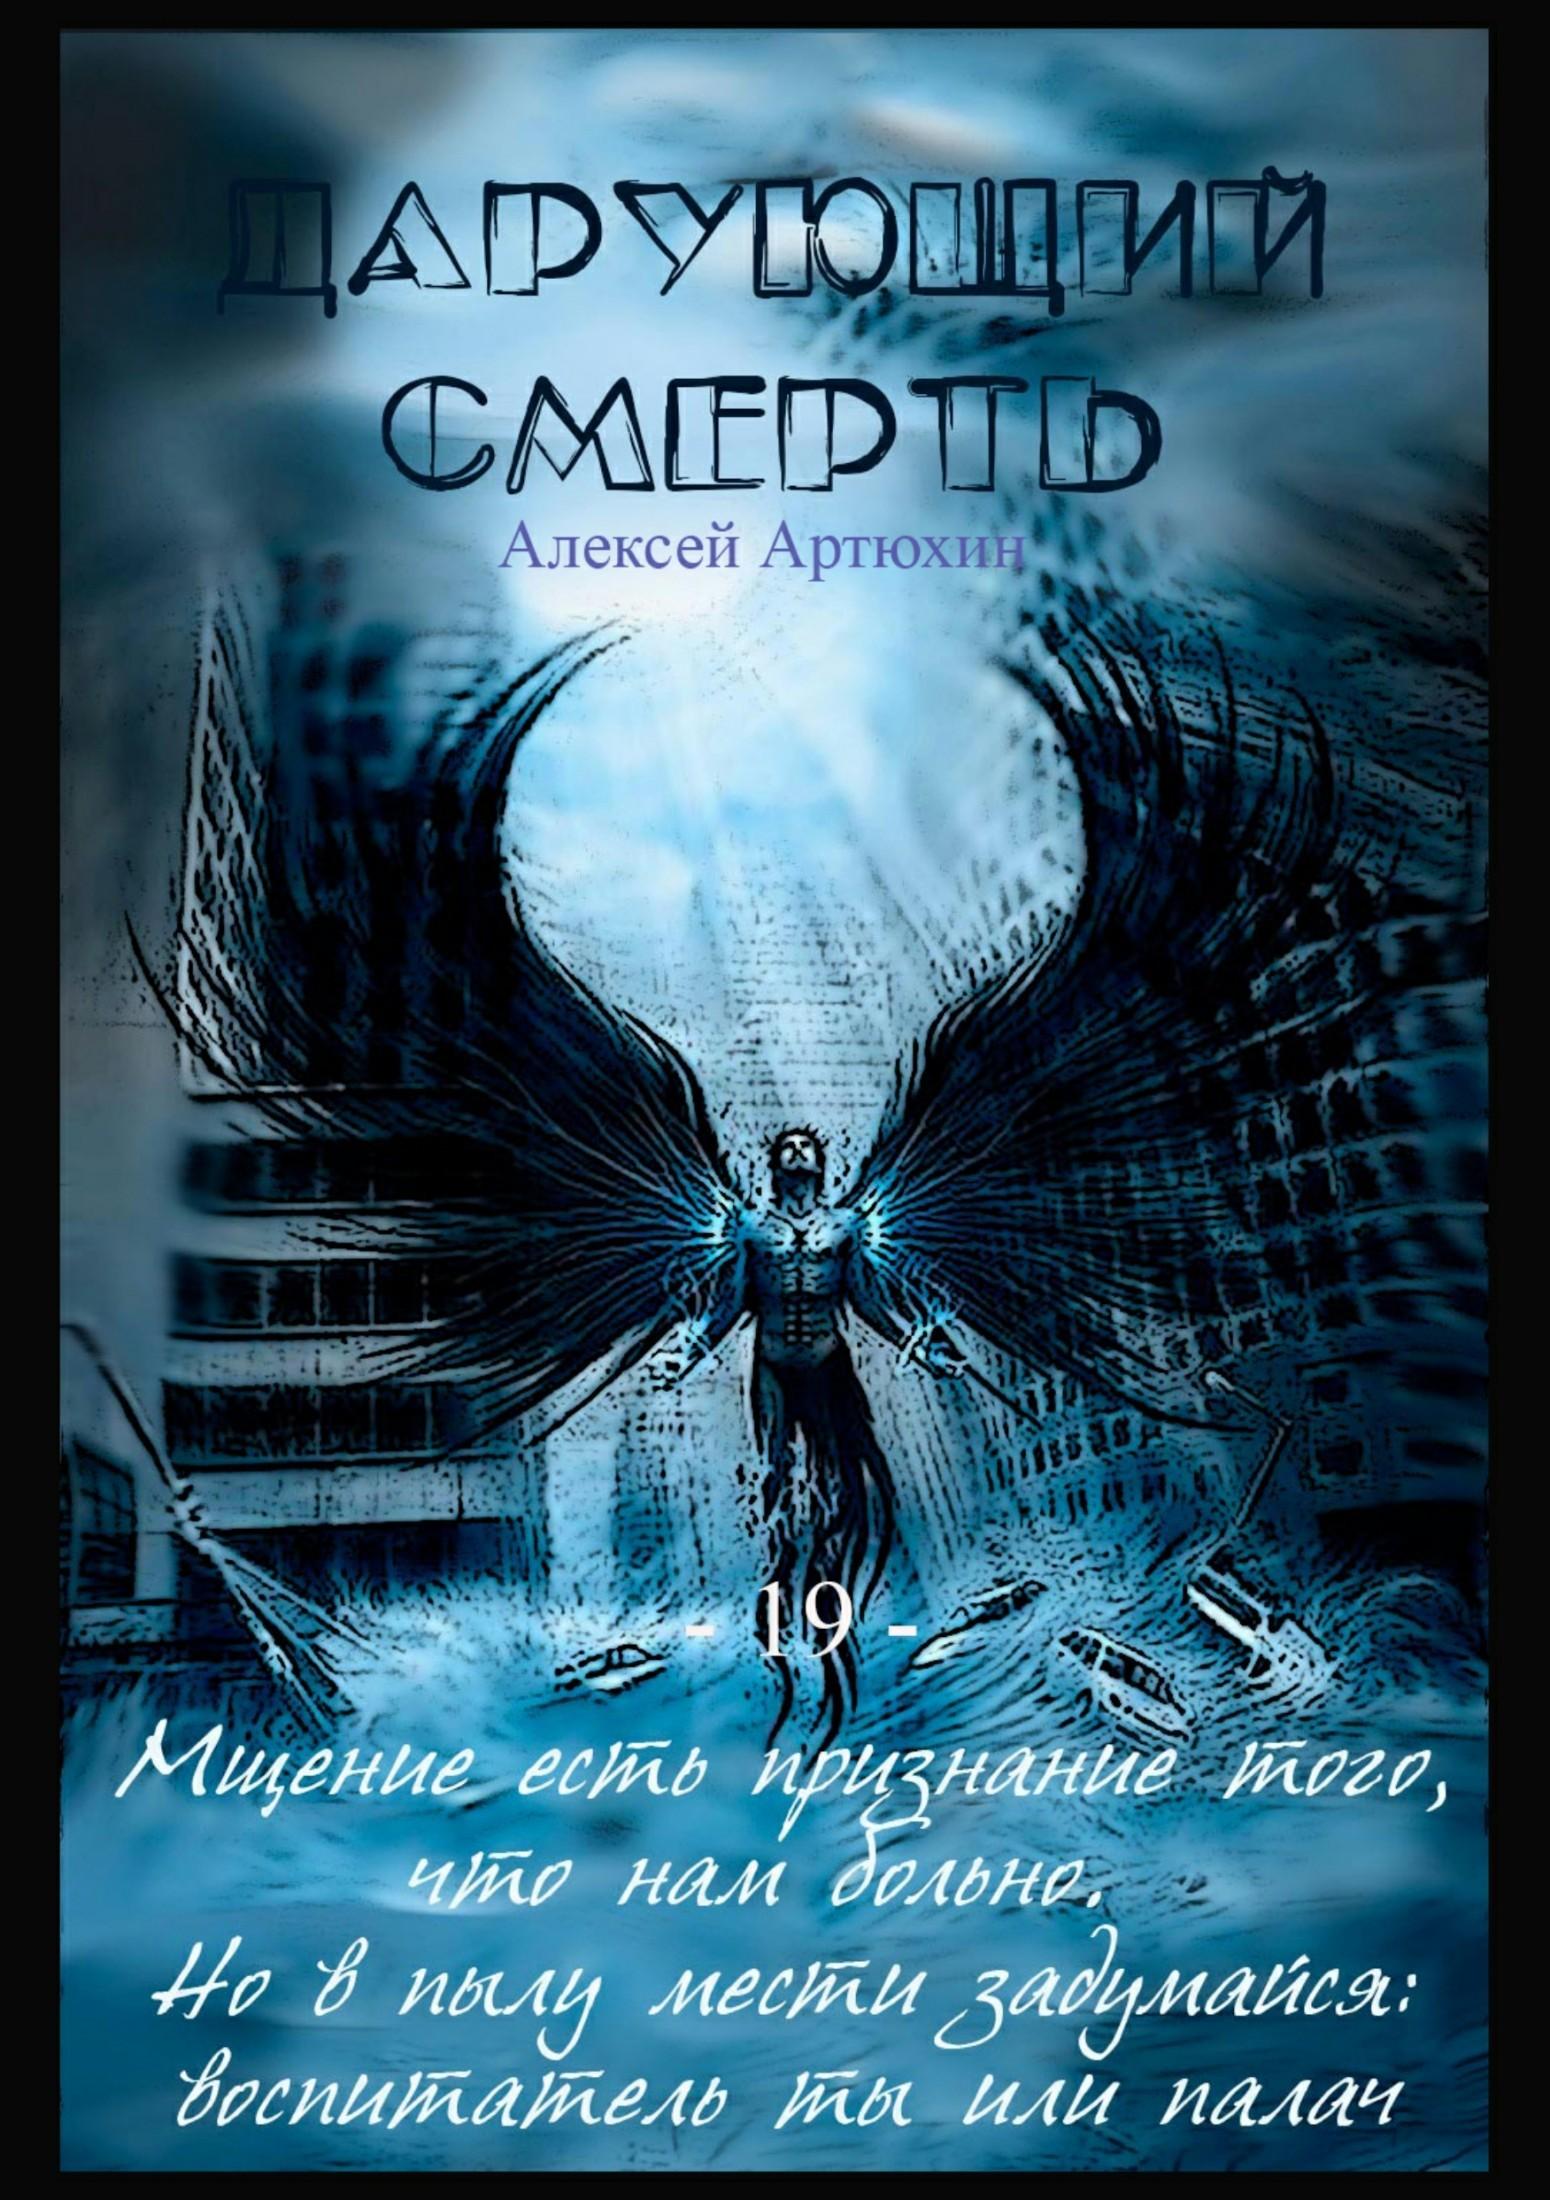 Алексей Артюхин - Дарующий Смерть